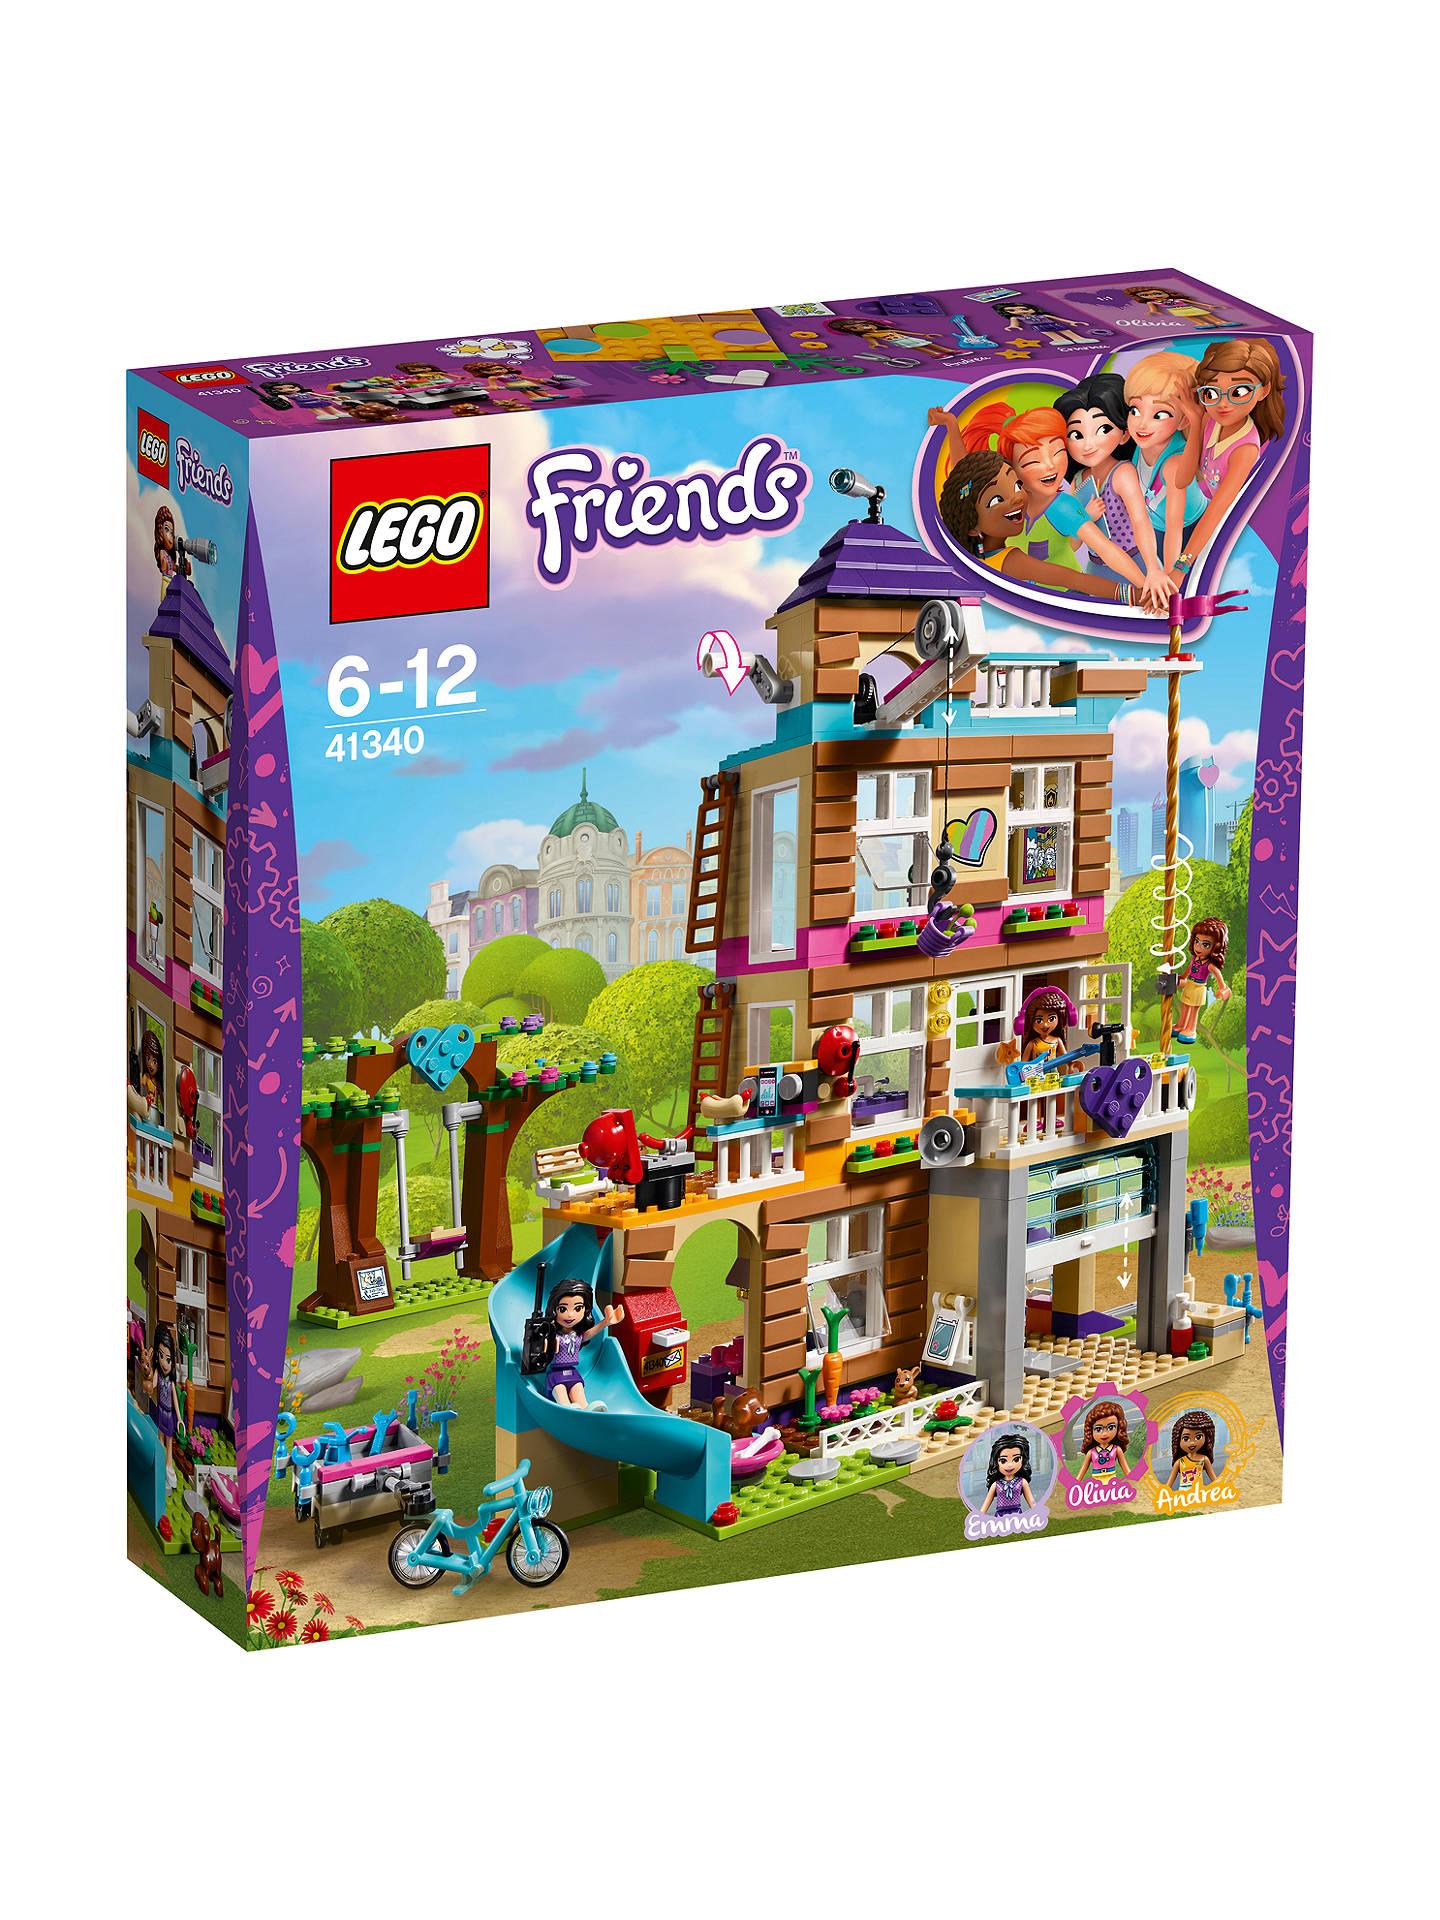 Lego Friends 41340 Friendship House At John Lewis Partners